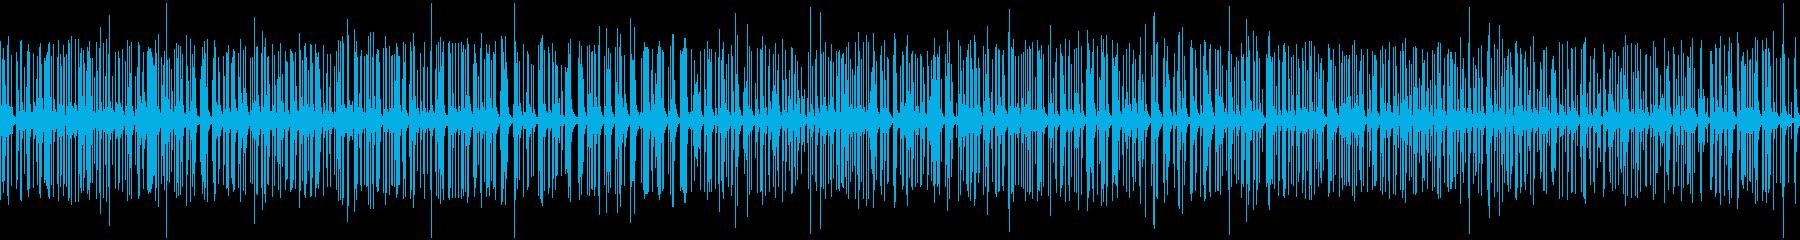 Audience applause crackling loop's reproduced waveform